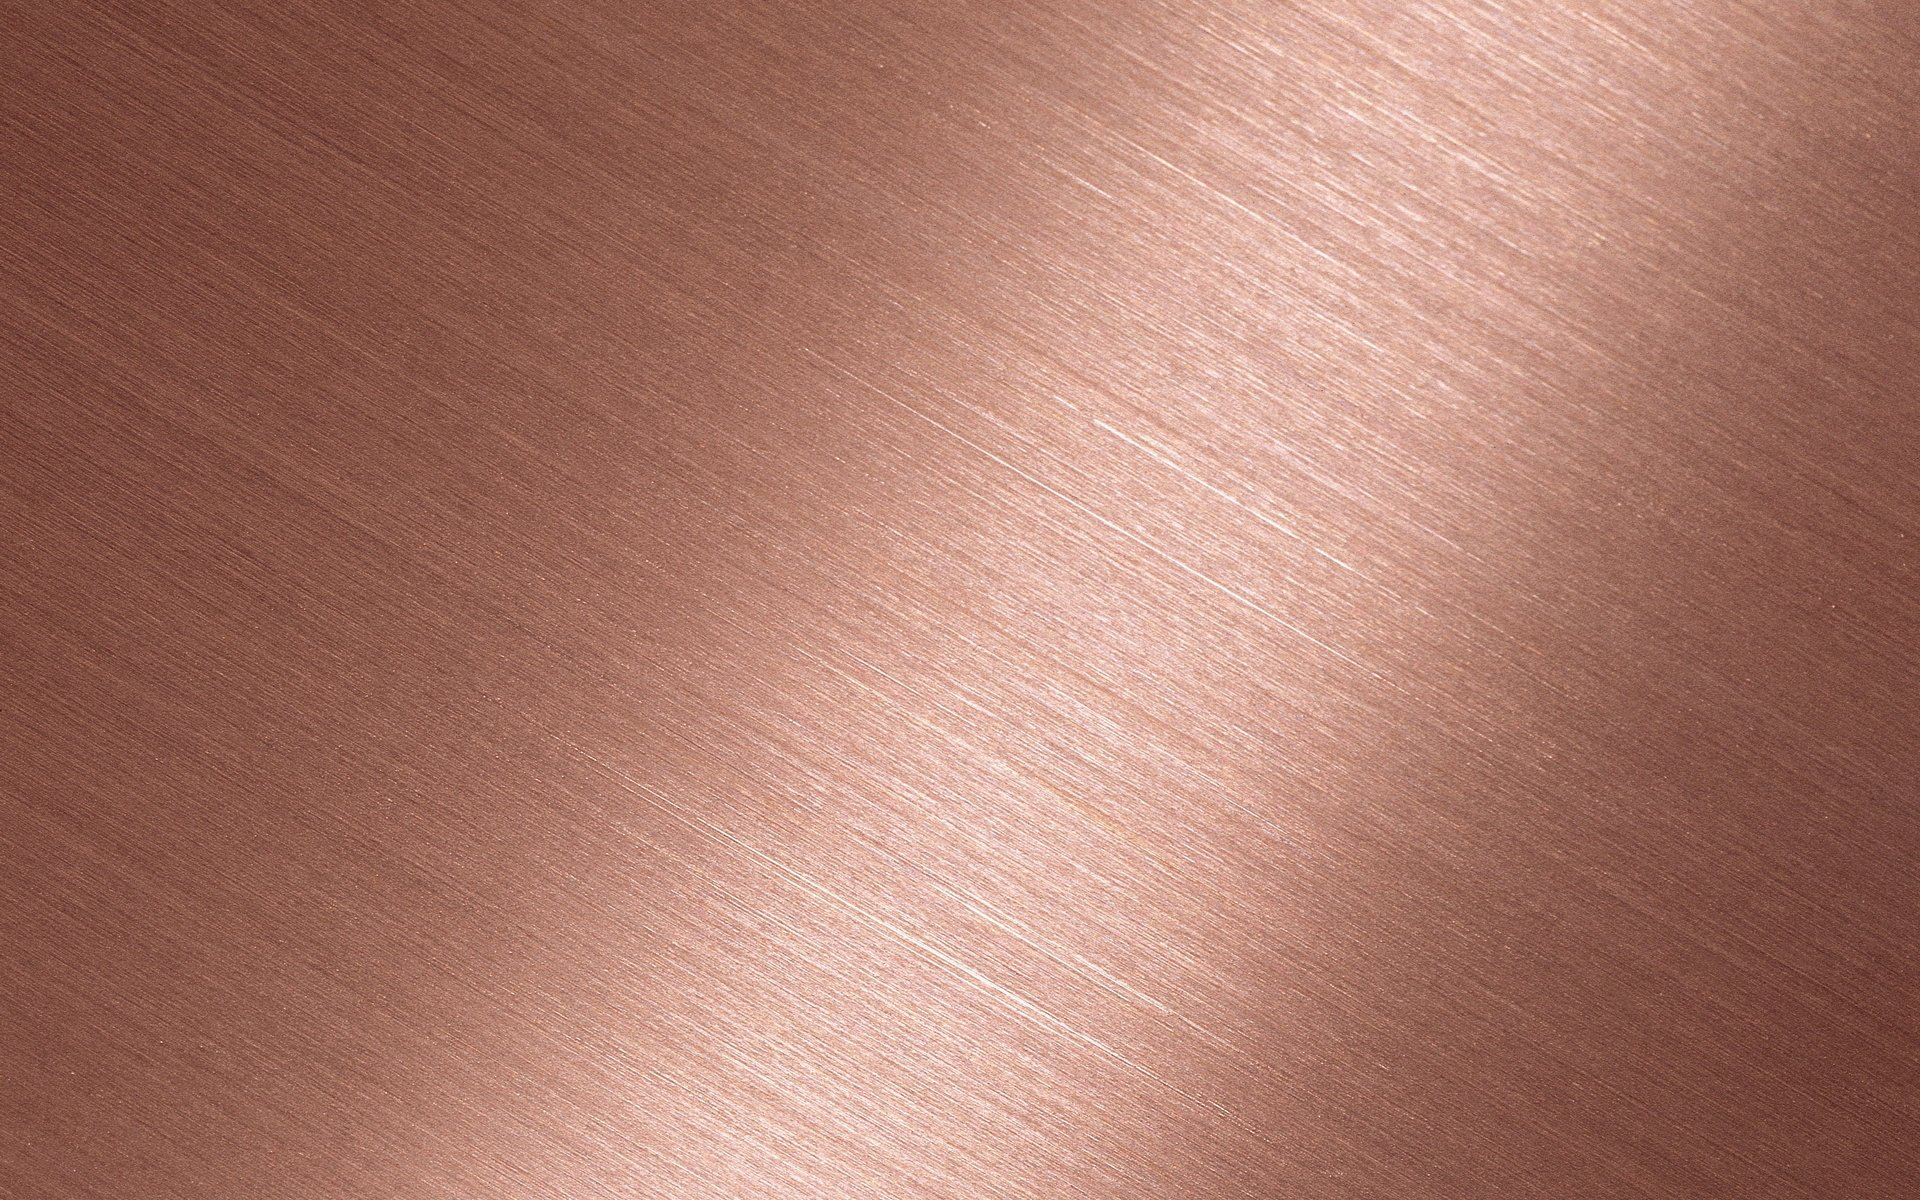 rose gold glitter wallpaper wallpapersafari. Black Bedroom Furniture Sets. Home Design Ideas